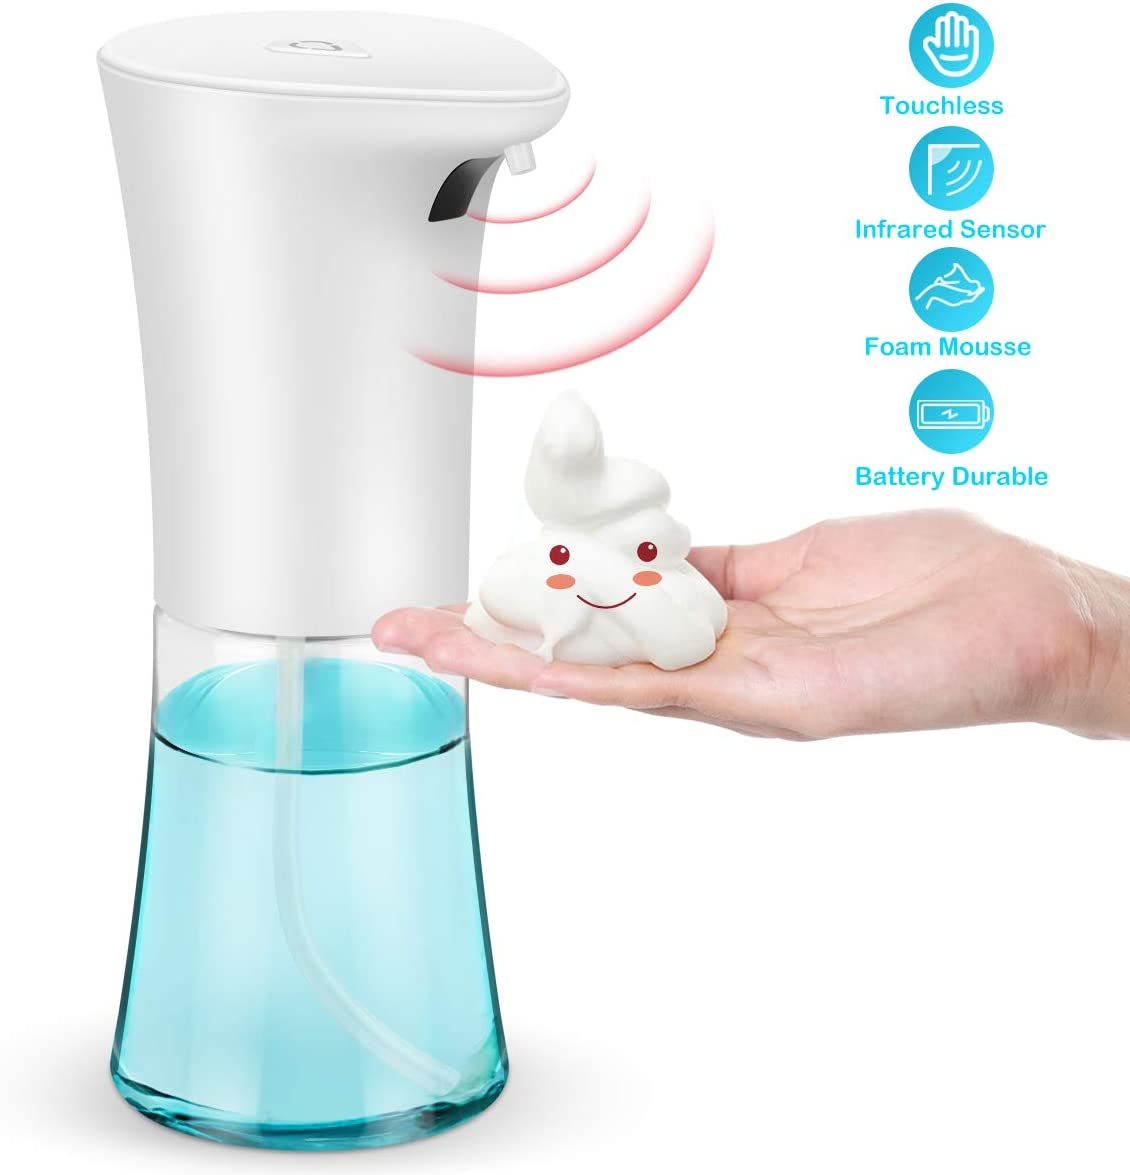 300ml Intelligent Touchless Automatic Sensor Foam Soap Dispenser Kitchen Hotel